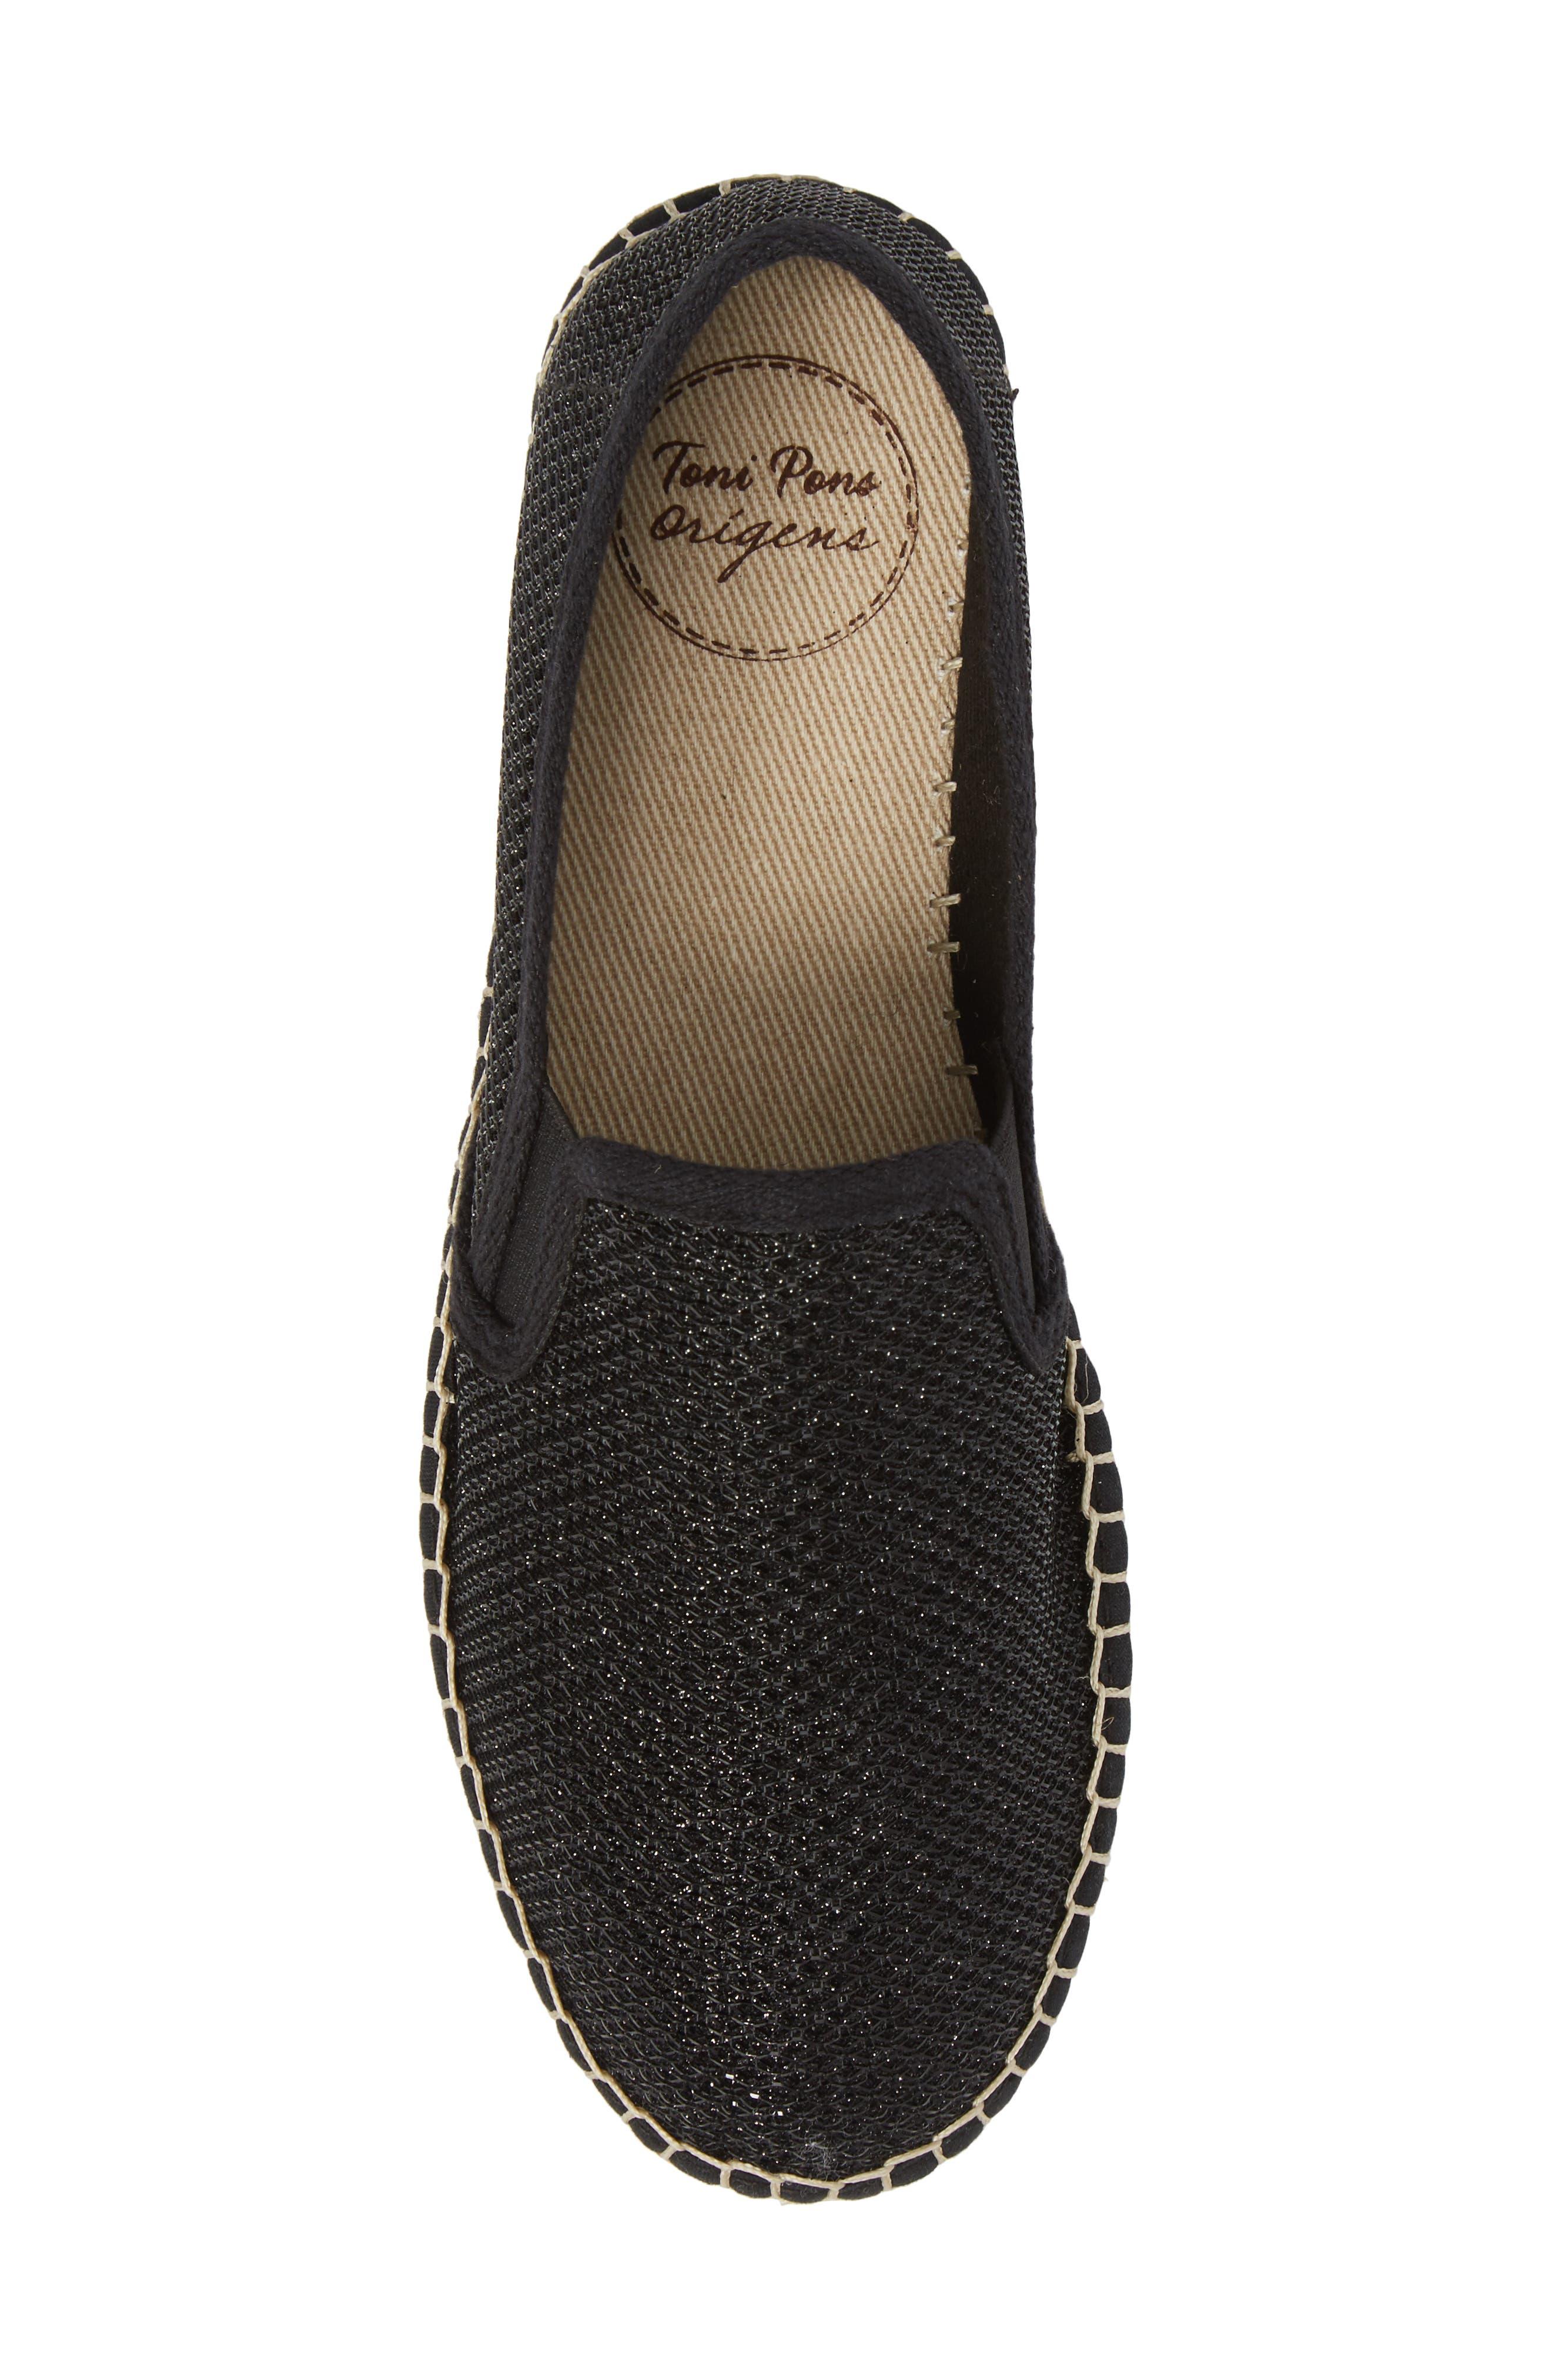 Fonda Platform Espadrille Sneaker,                             Alternate thumbnail 5, color,                             BLACK FABRIC